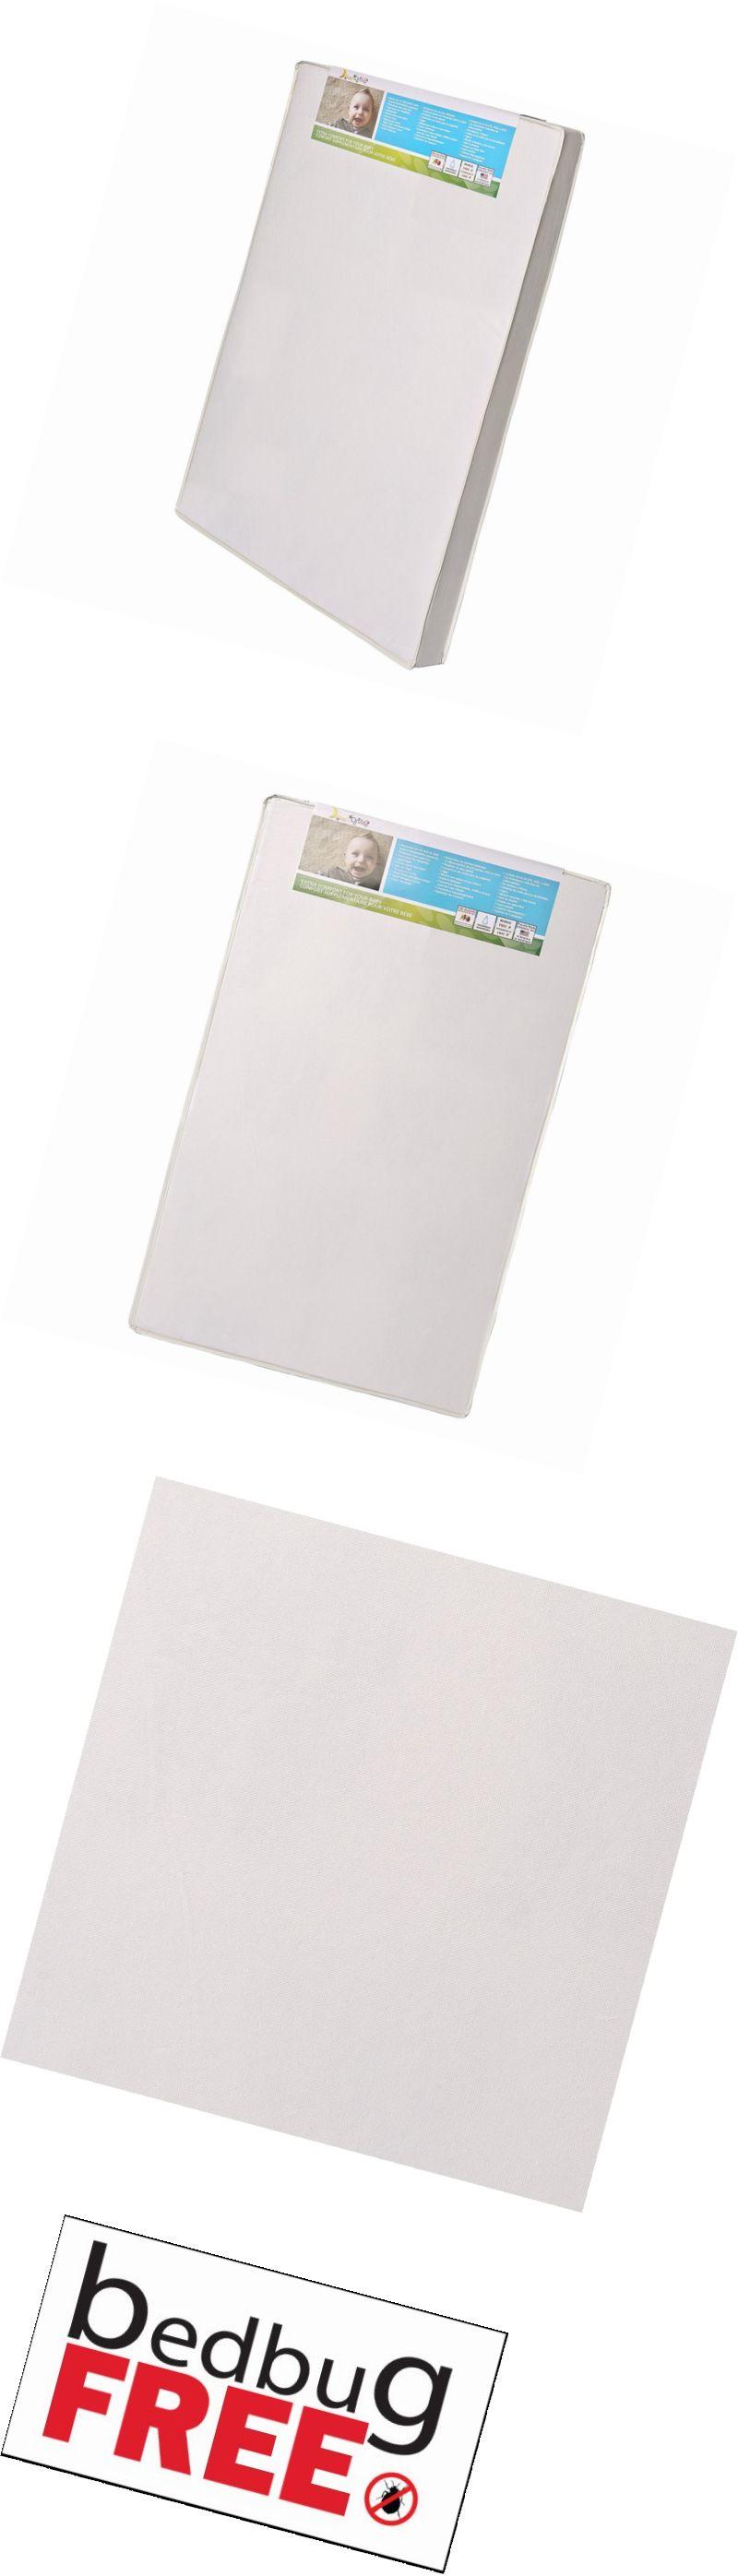 Crib Mattresses 117035: Dream On Me 3 Extra Firm Portable Crib Mattress,  White